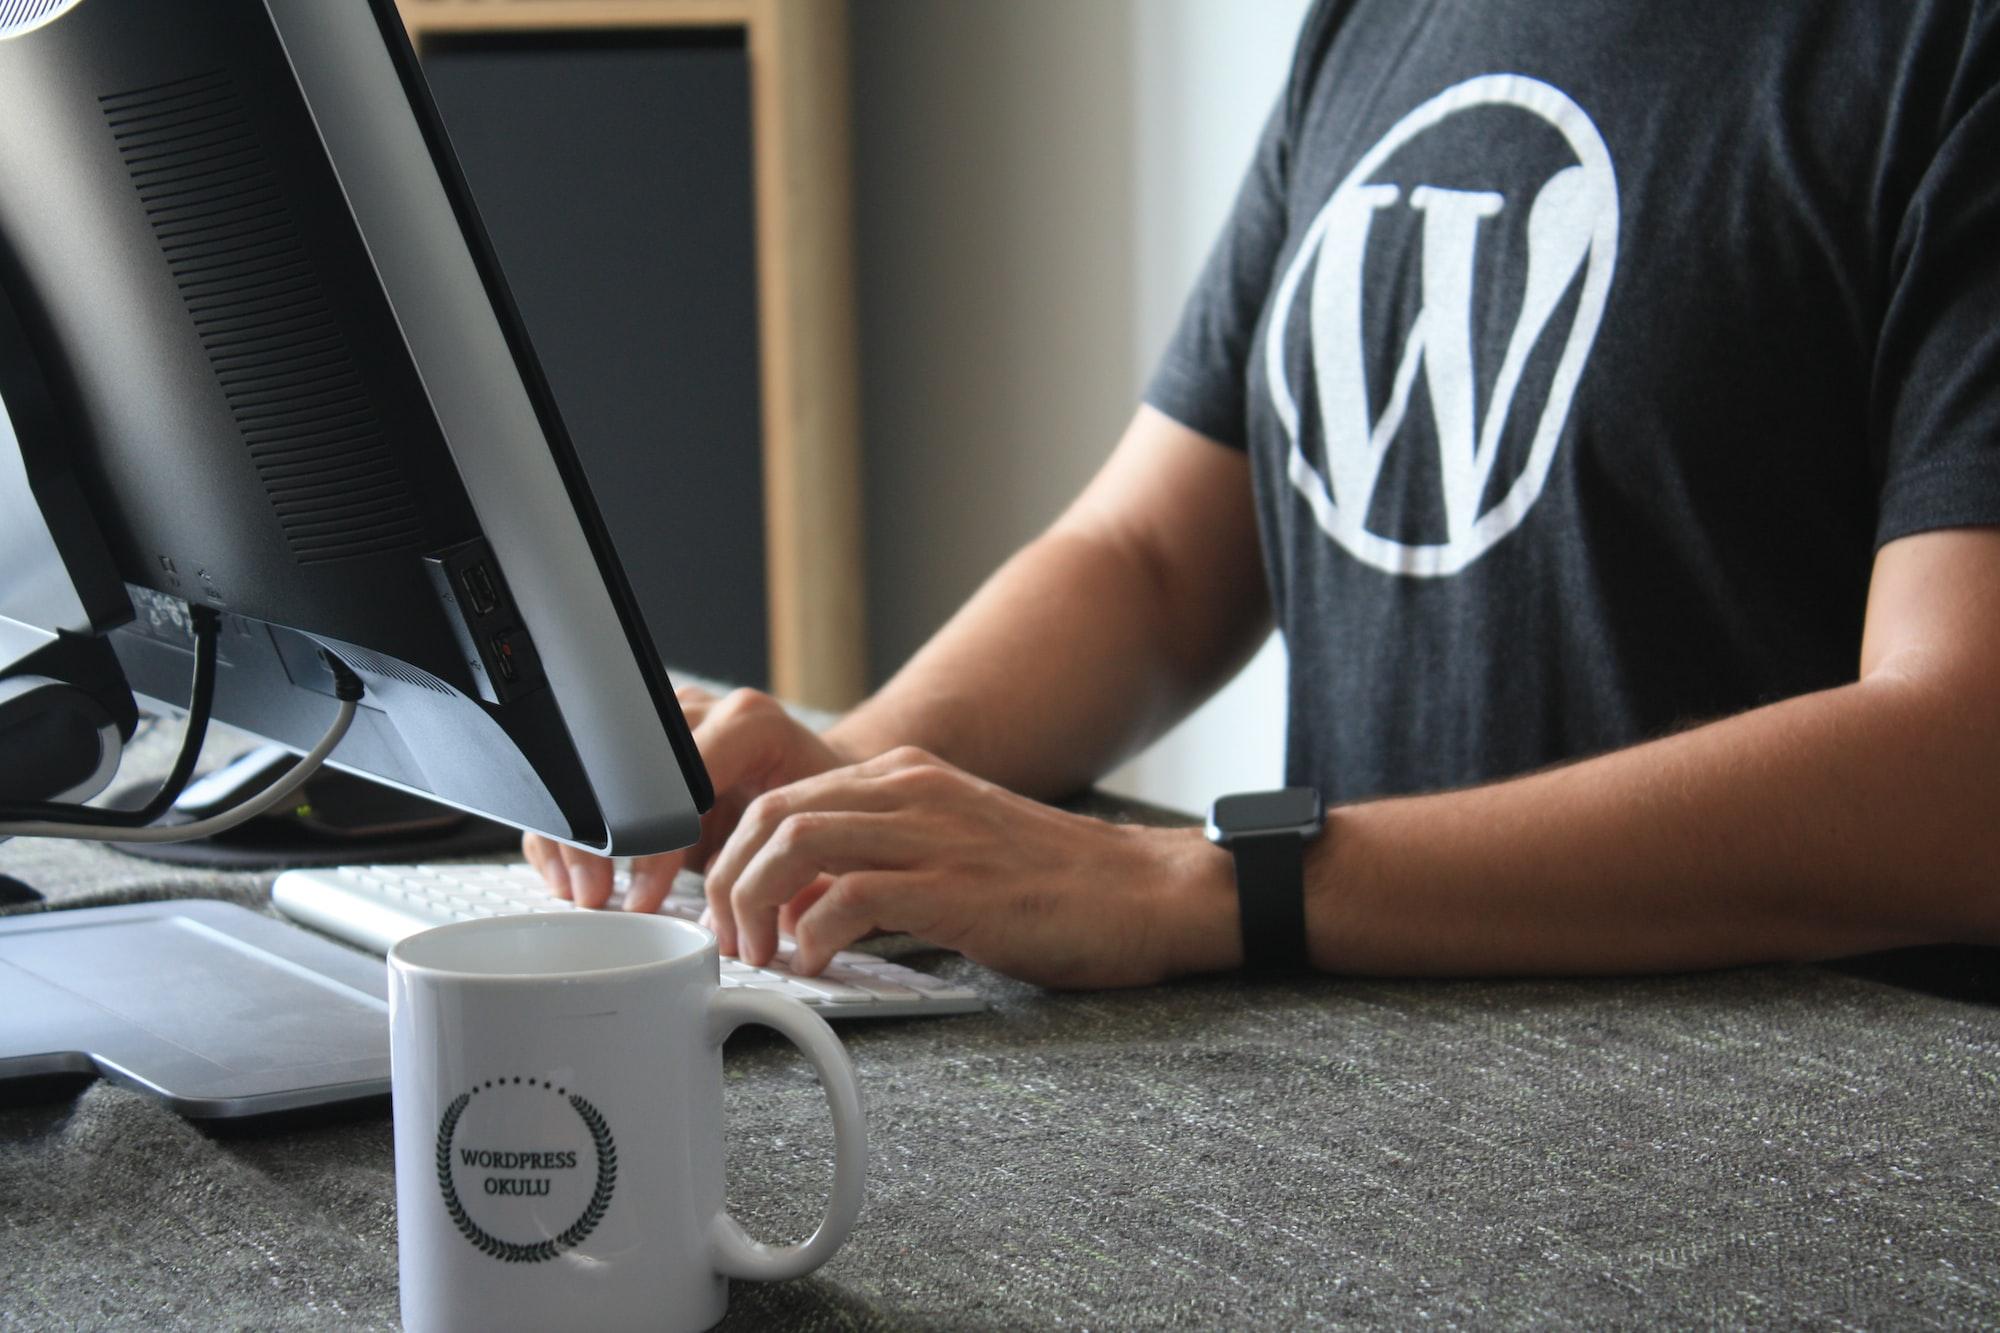 WordPress Mobile App: The reason to use the block editor